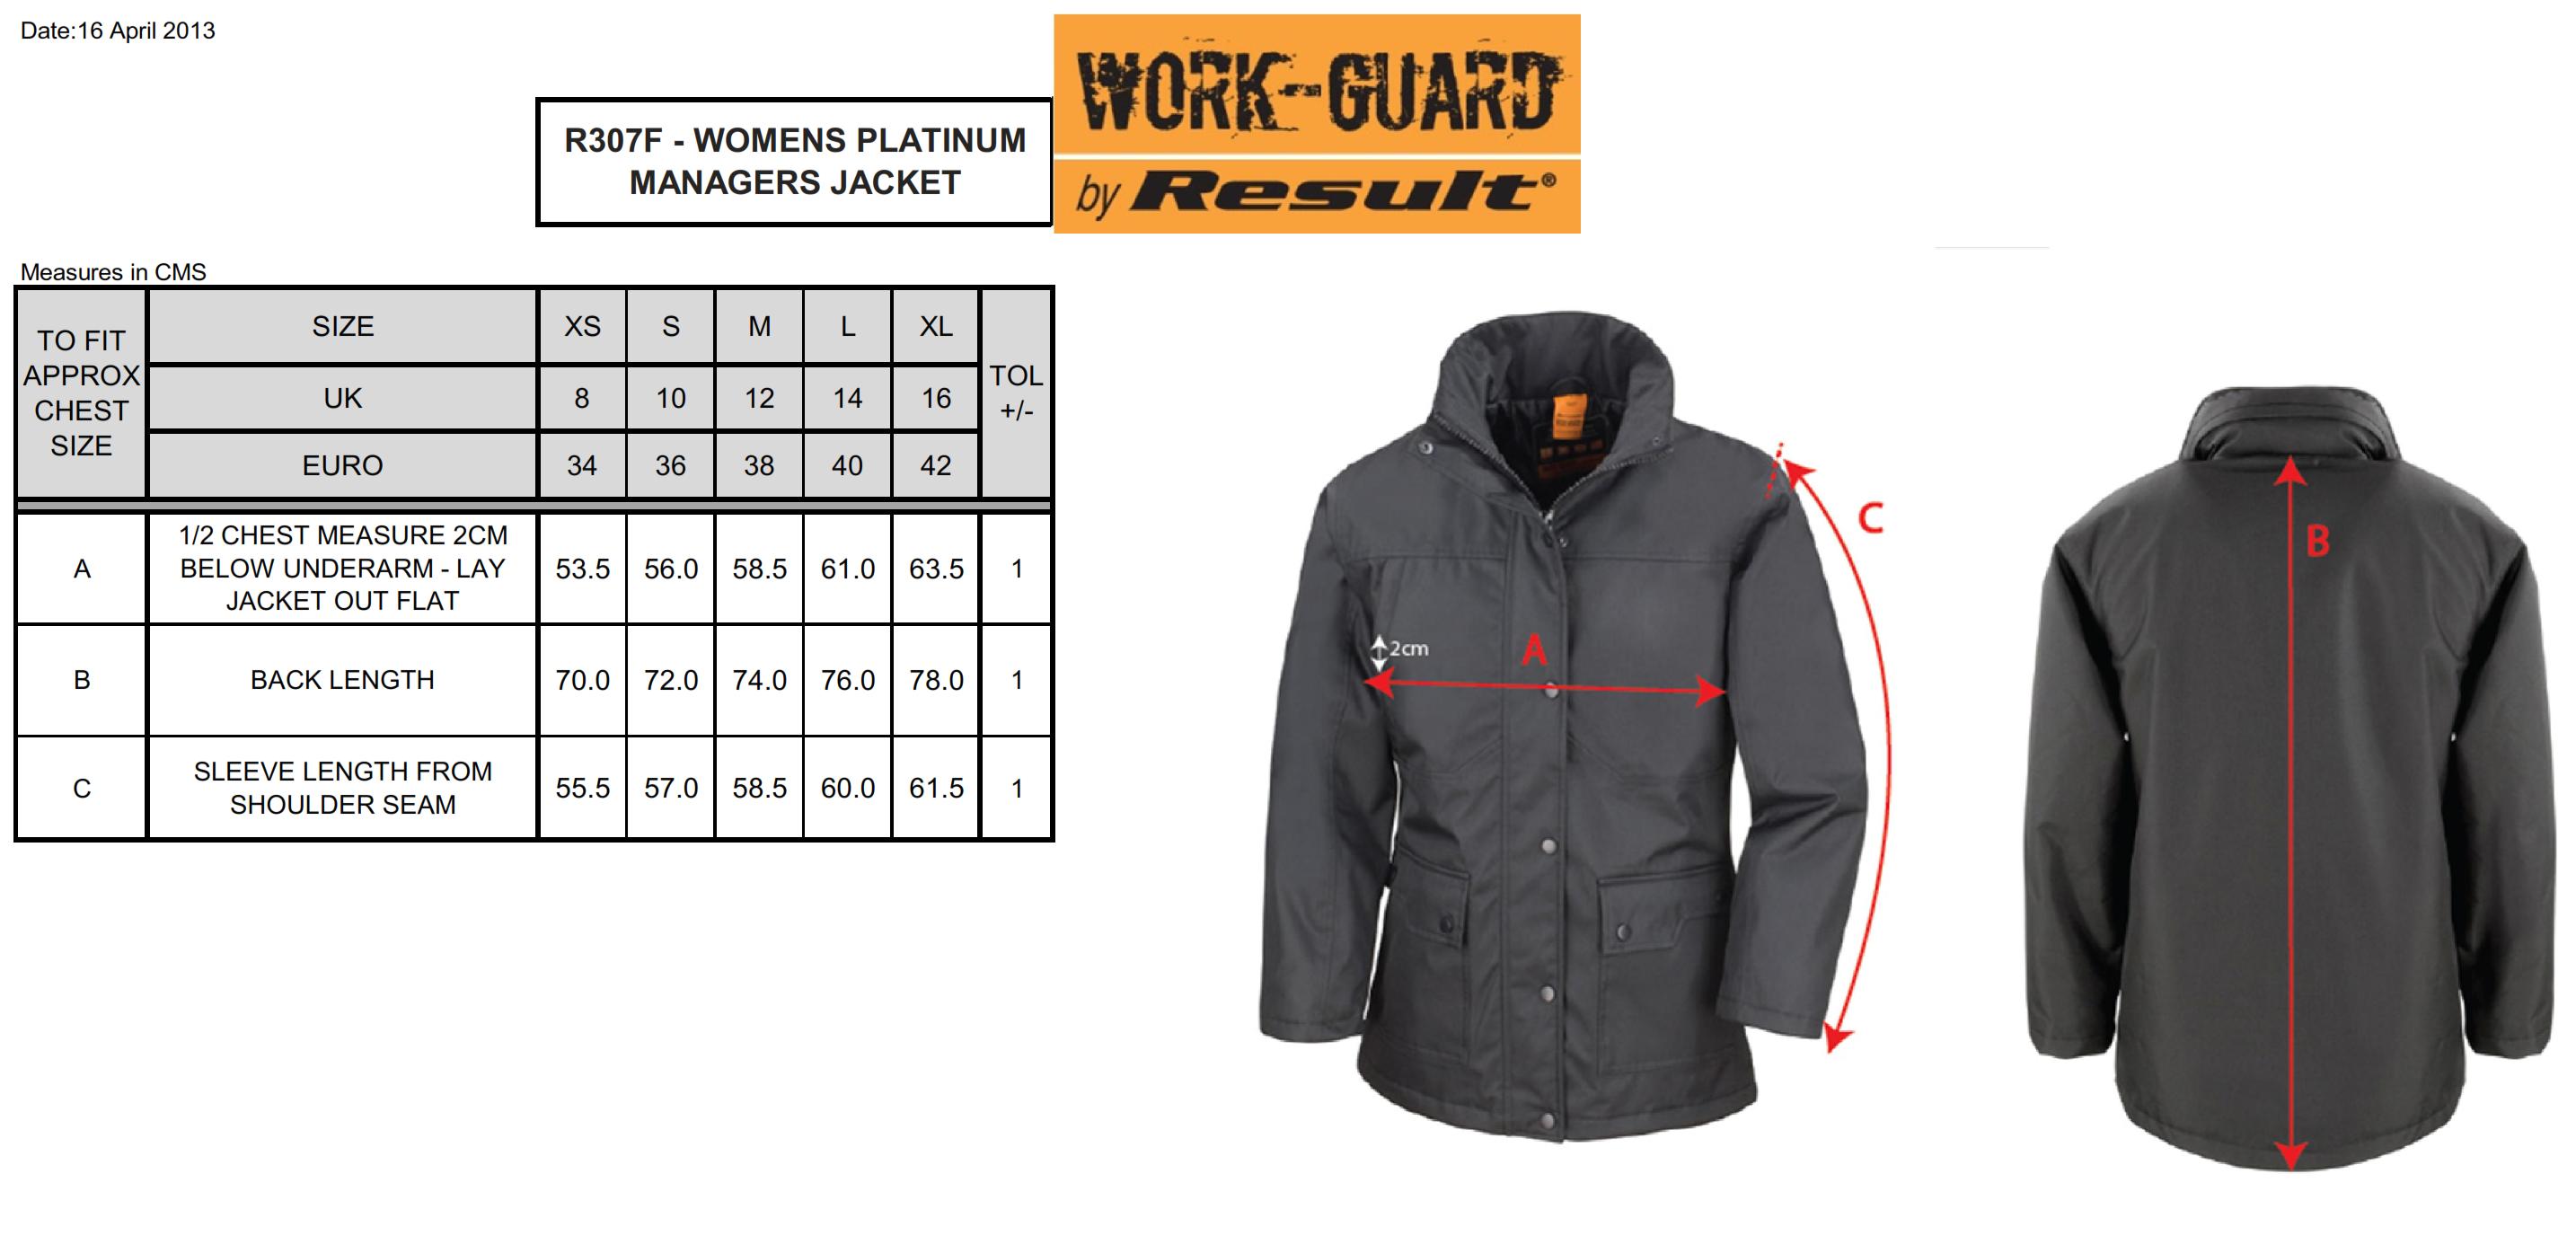 Result: Ladies` Platinum Managers Jacket R307F